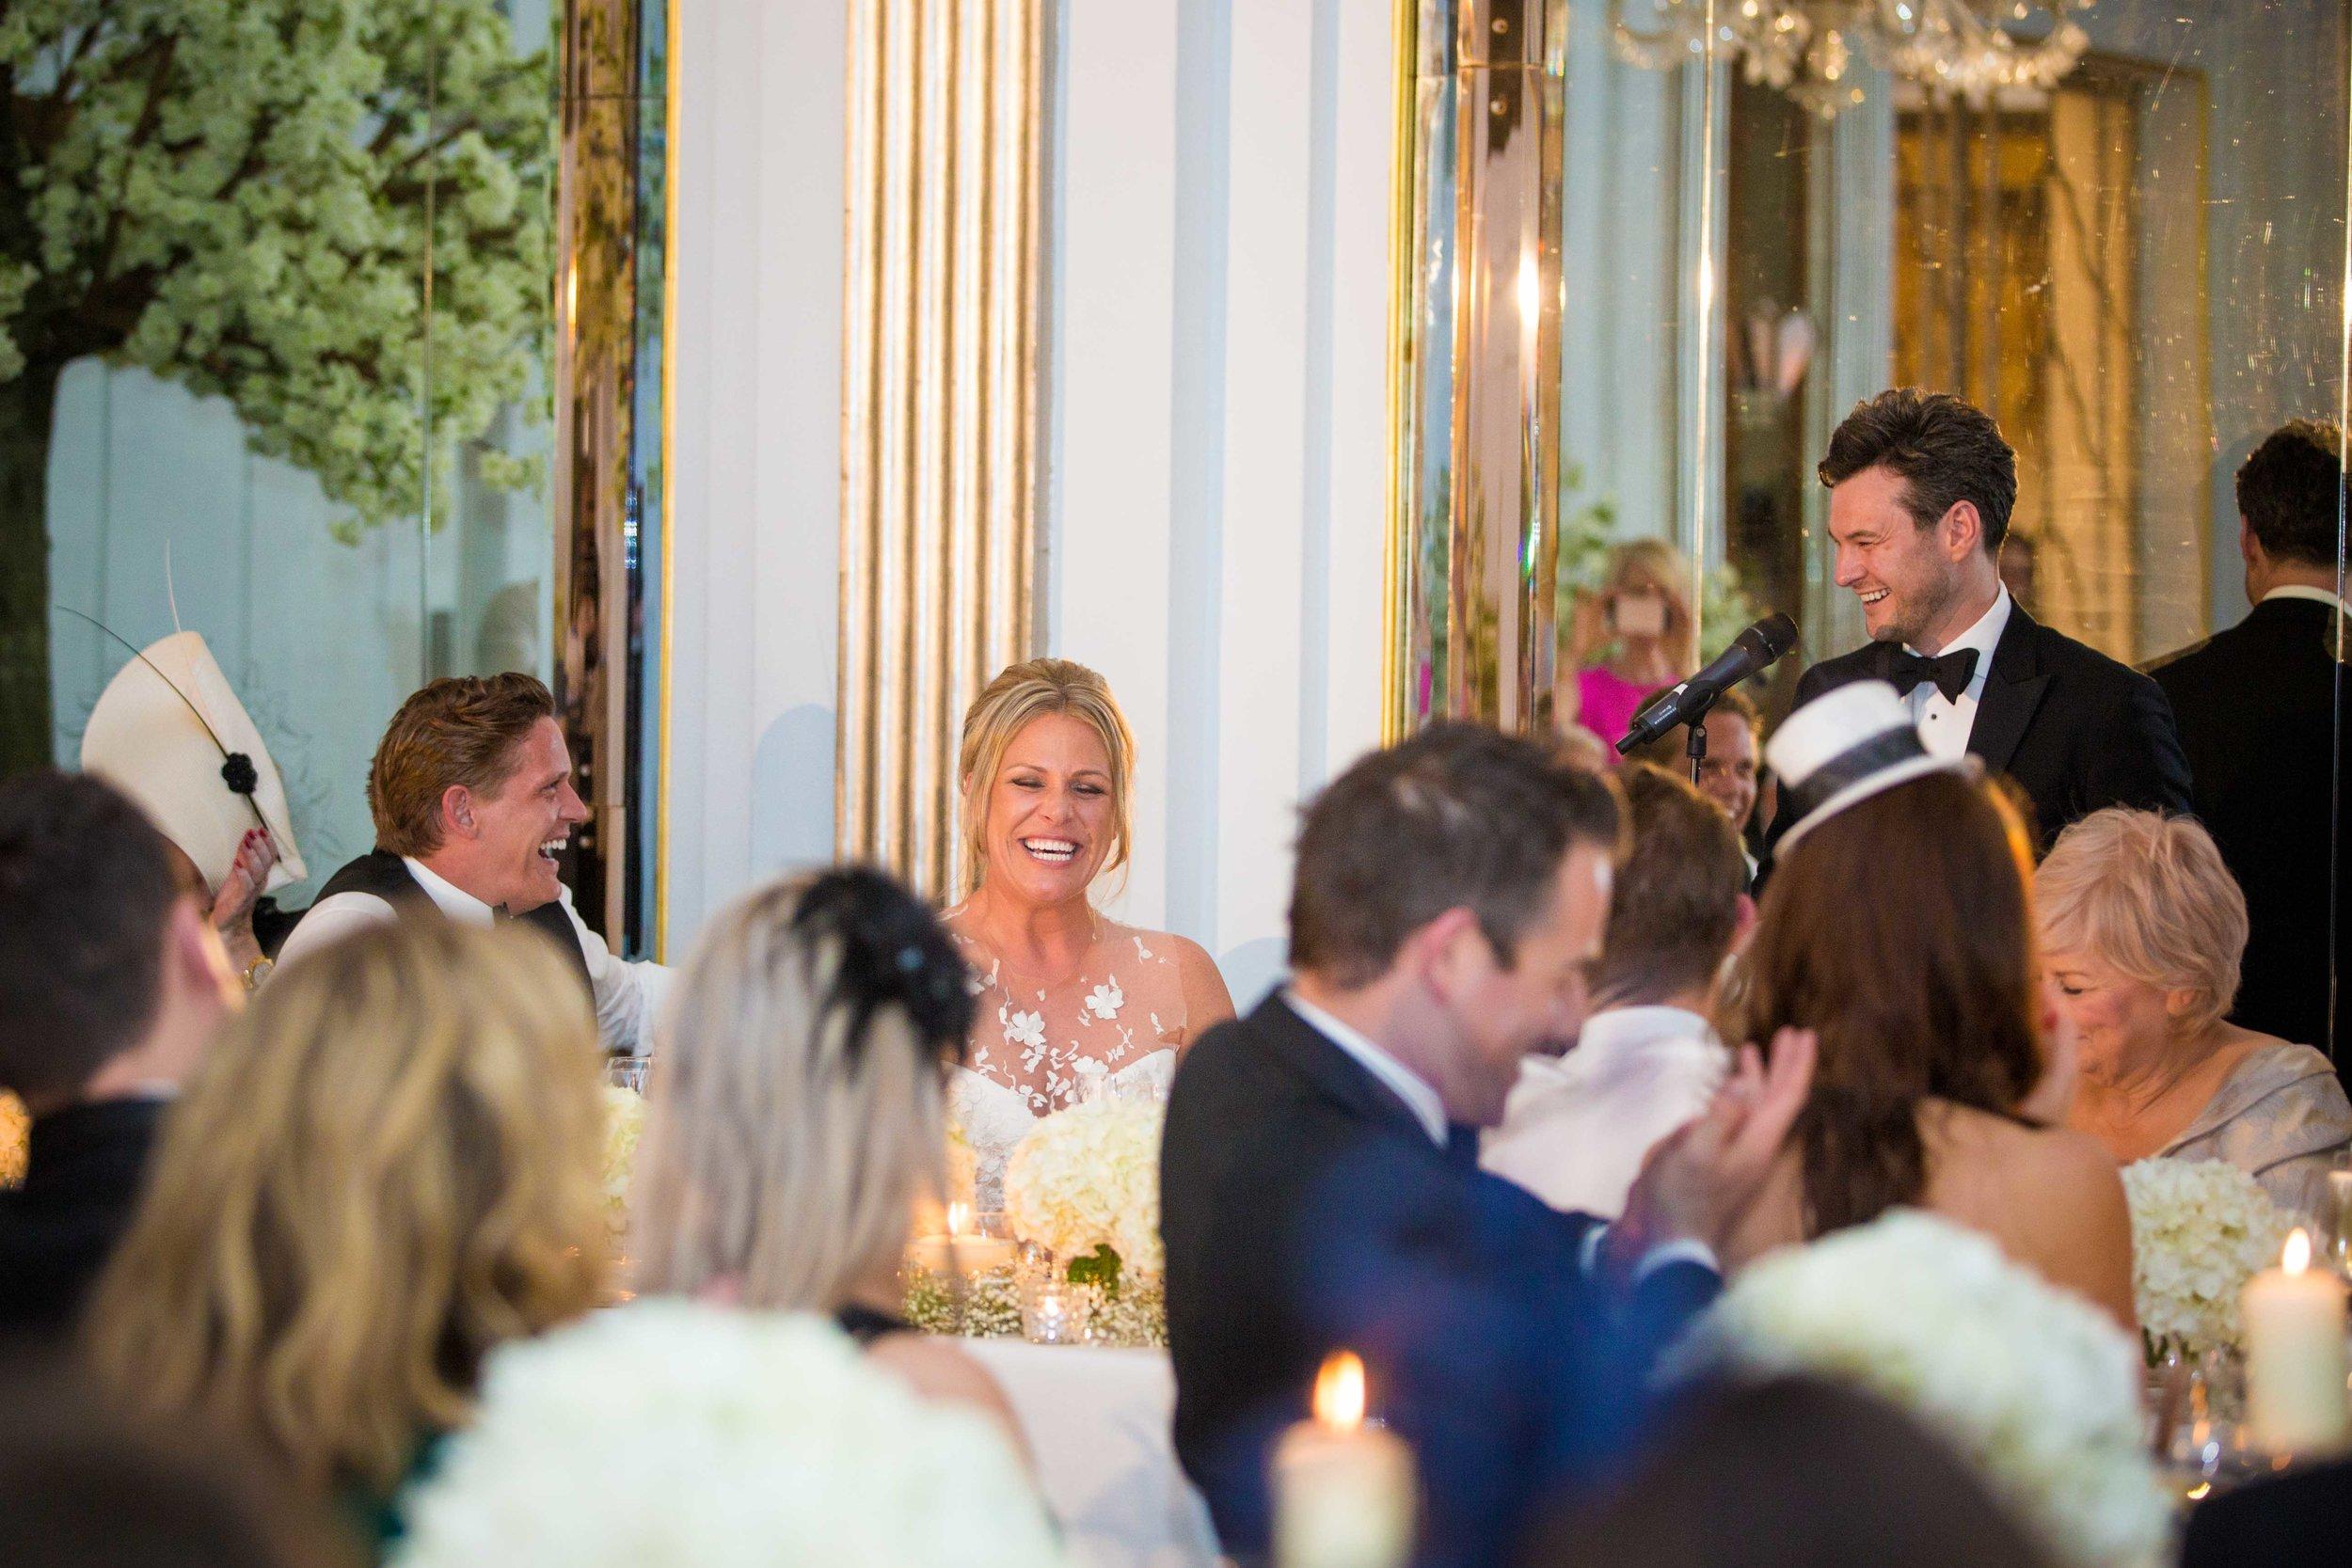 claridges-hotel-wedding-photographer-london-mayfair-natalia-smith-photography-126.jpg